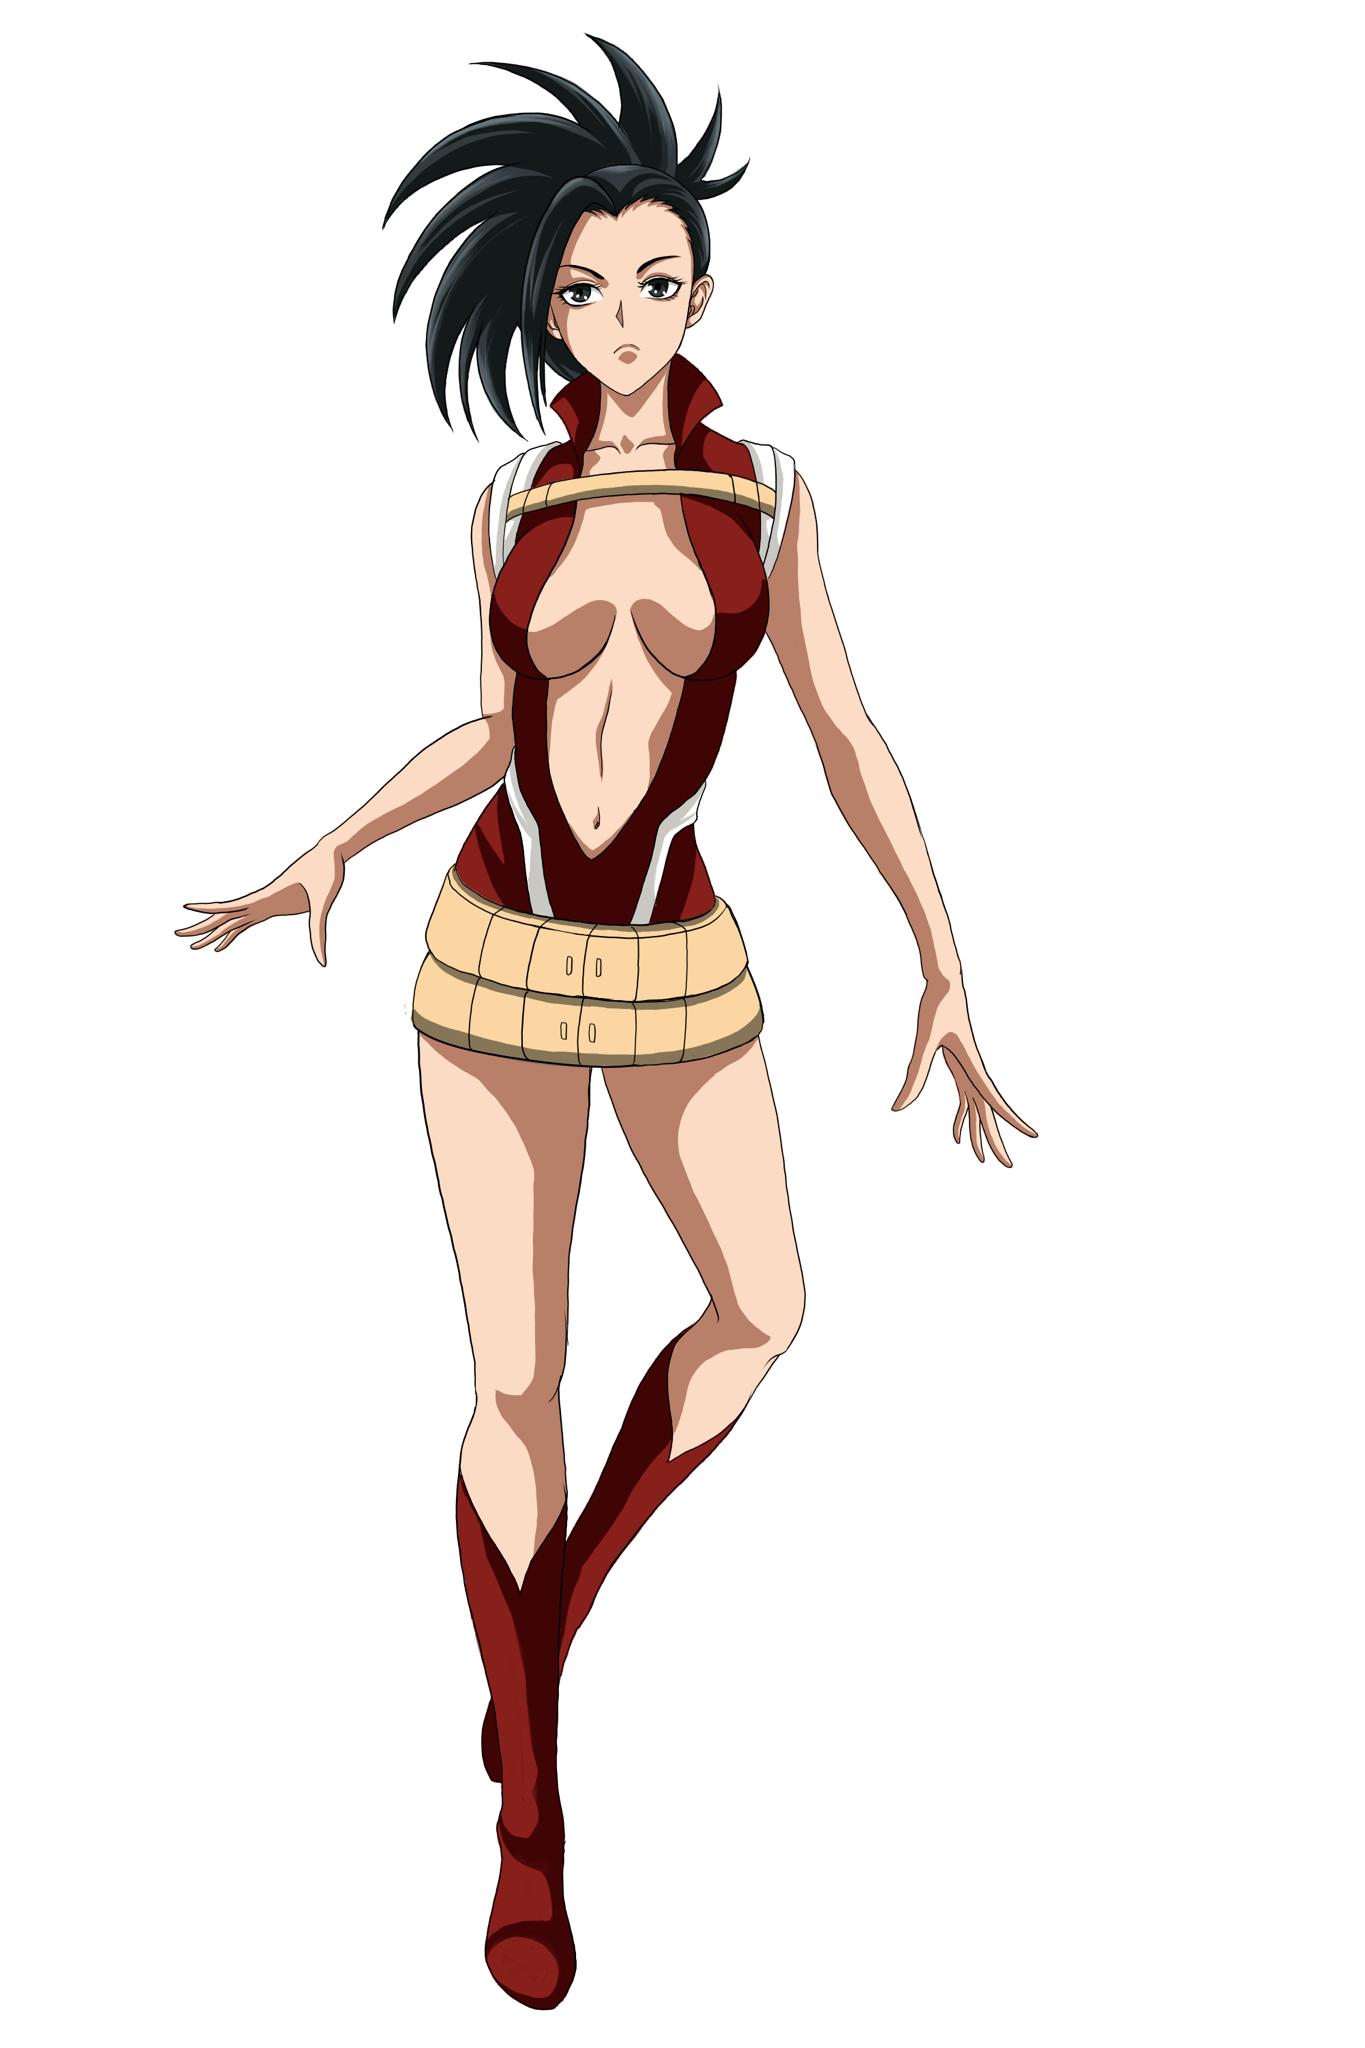 Momo yaoyorozu.